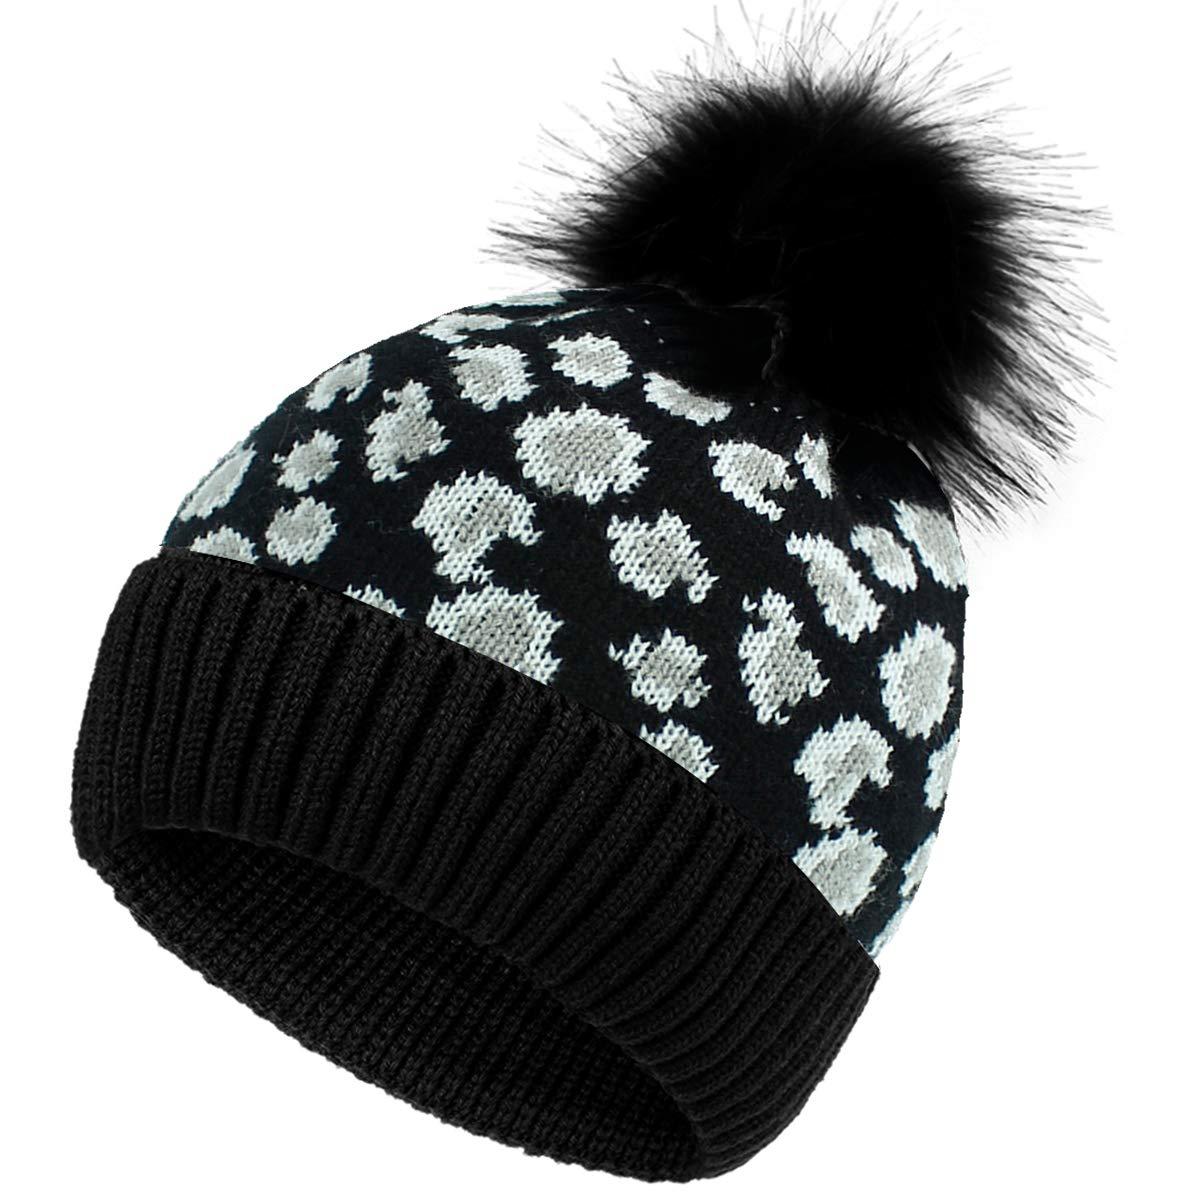 HelloCreate Women Knit Hat, Warm Soft Knit Hat Leopard Print Fashion Winter Pompom Ball Hat